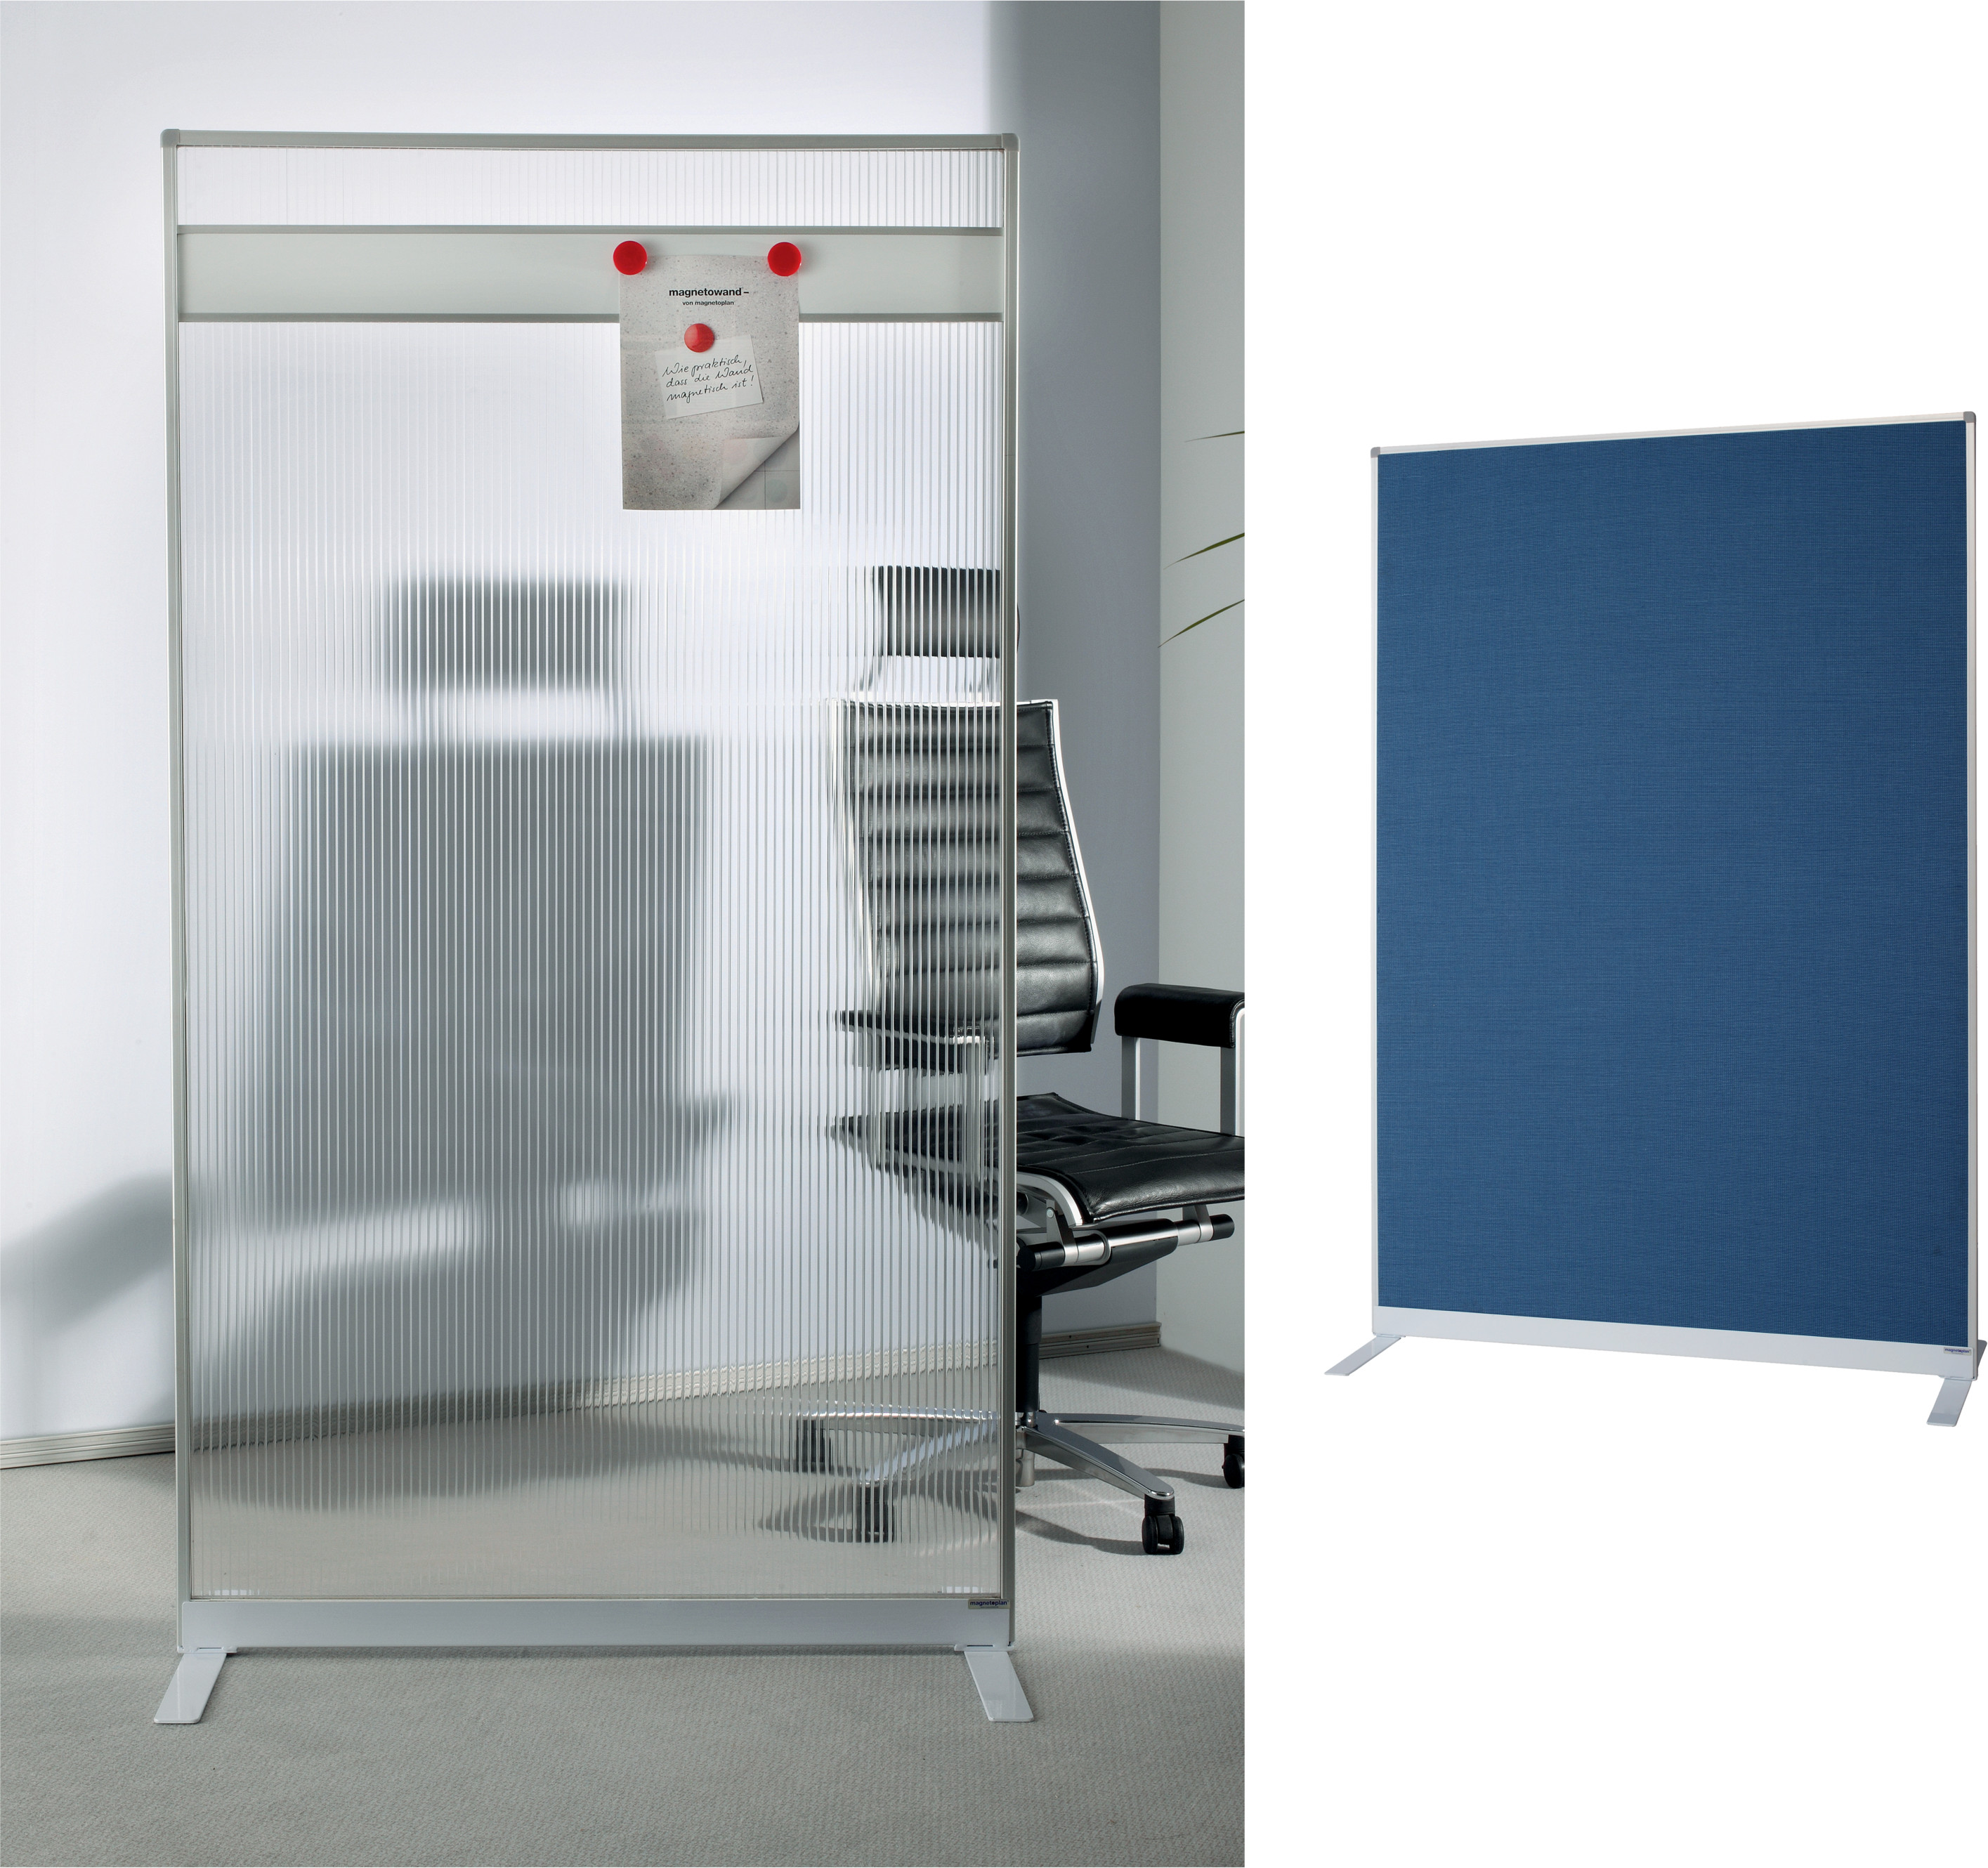 officio raumteiler trennw nde filz acryl alu rahmen. Black Bedroom Furniture Sets. Home Design Ideas